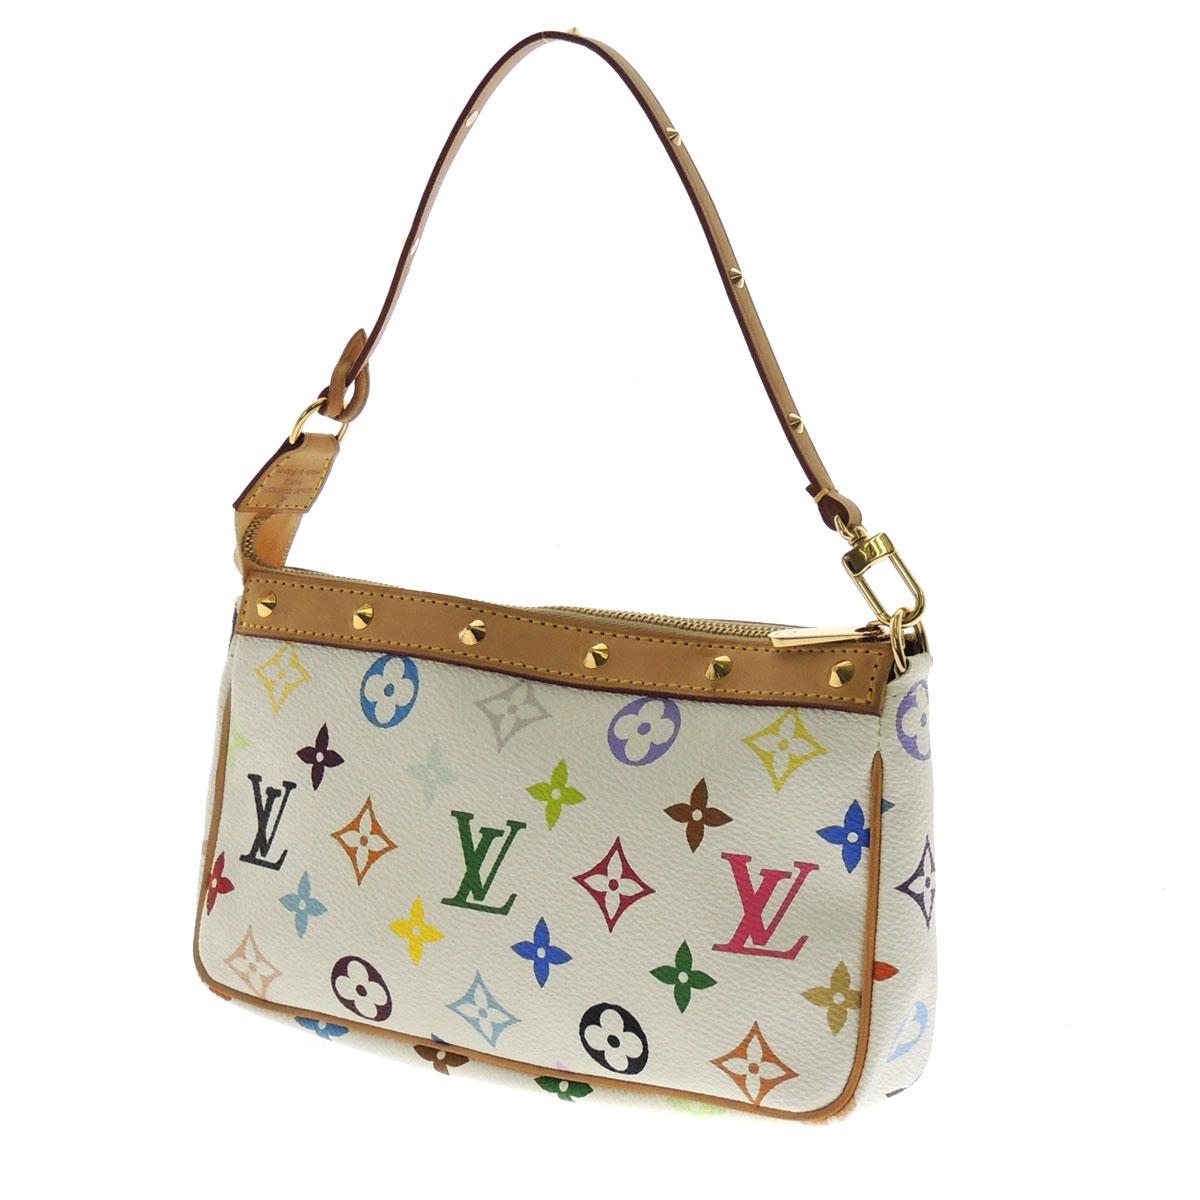 LOUIS VUITTON pochettaxesovar strap M92649 accessory pouch Monogram multi color canvas Womens